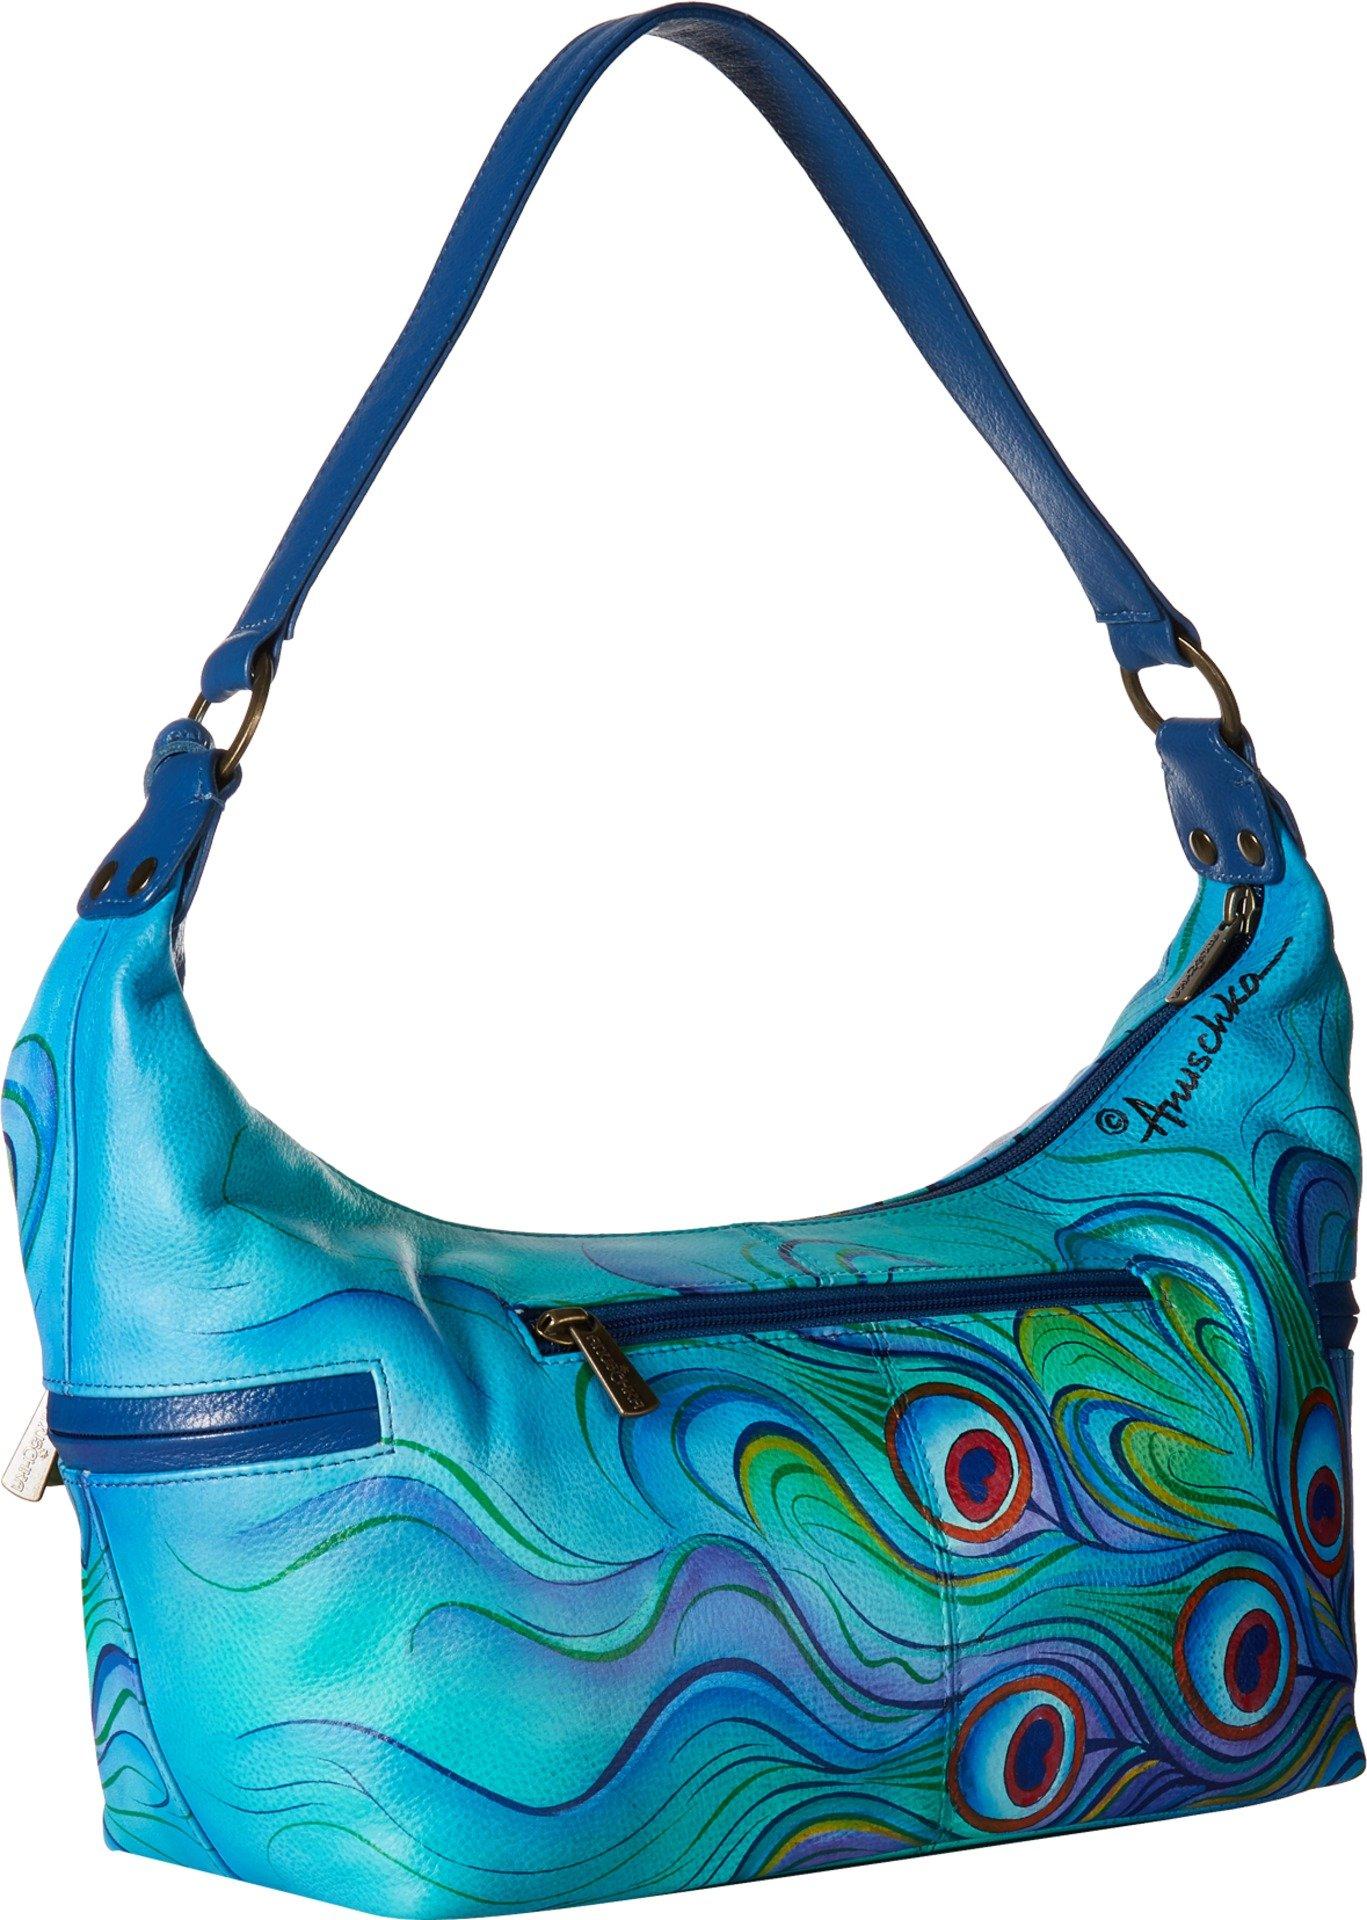 Anuschka Handbags Women's 510 East West Medium Hobo Jewelled Plume Handbag by ANUSCHKA (Image #2)